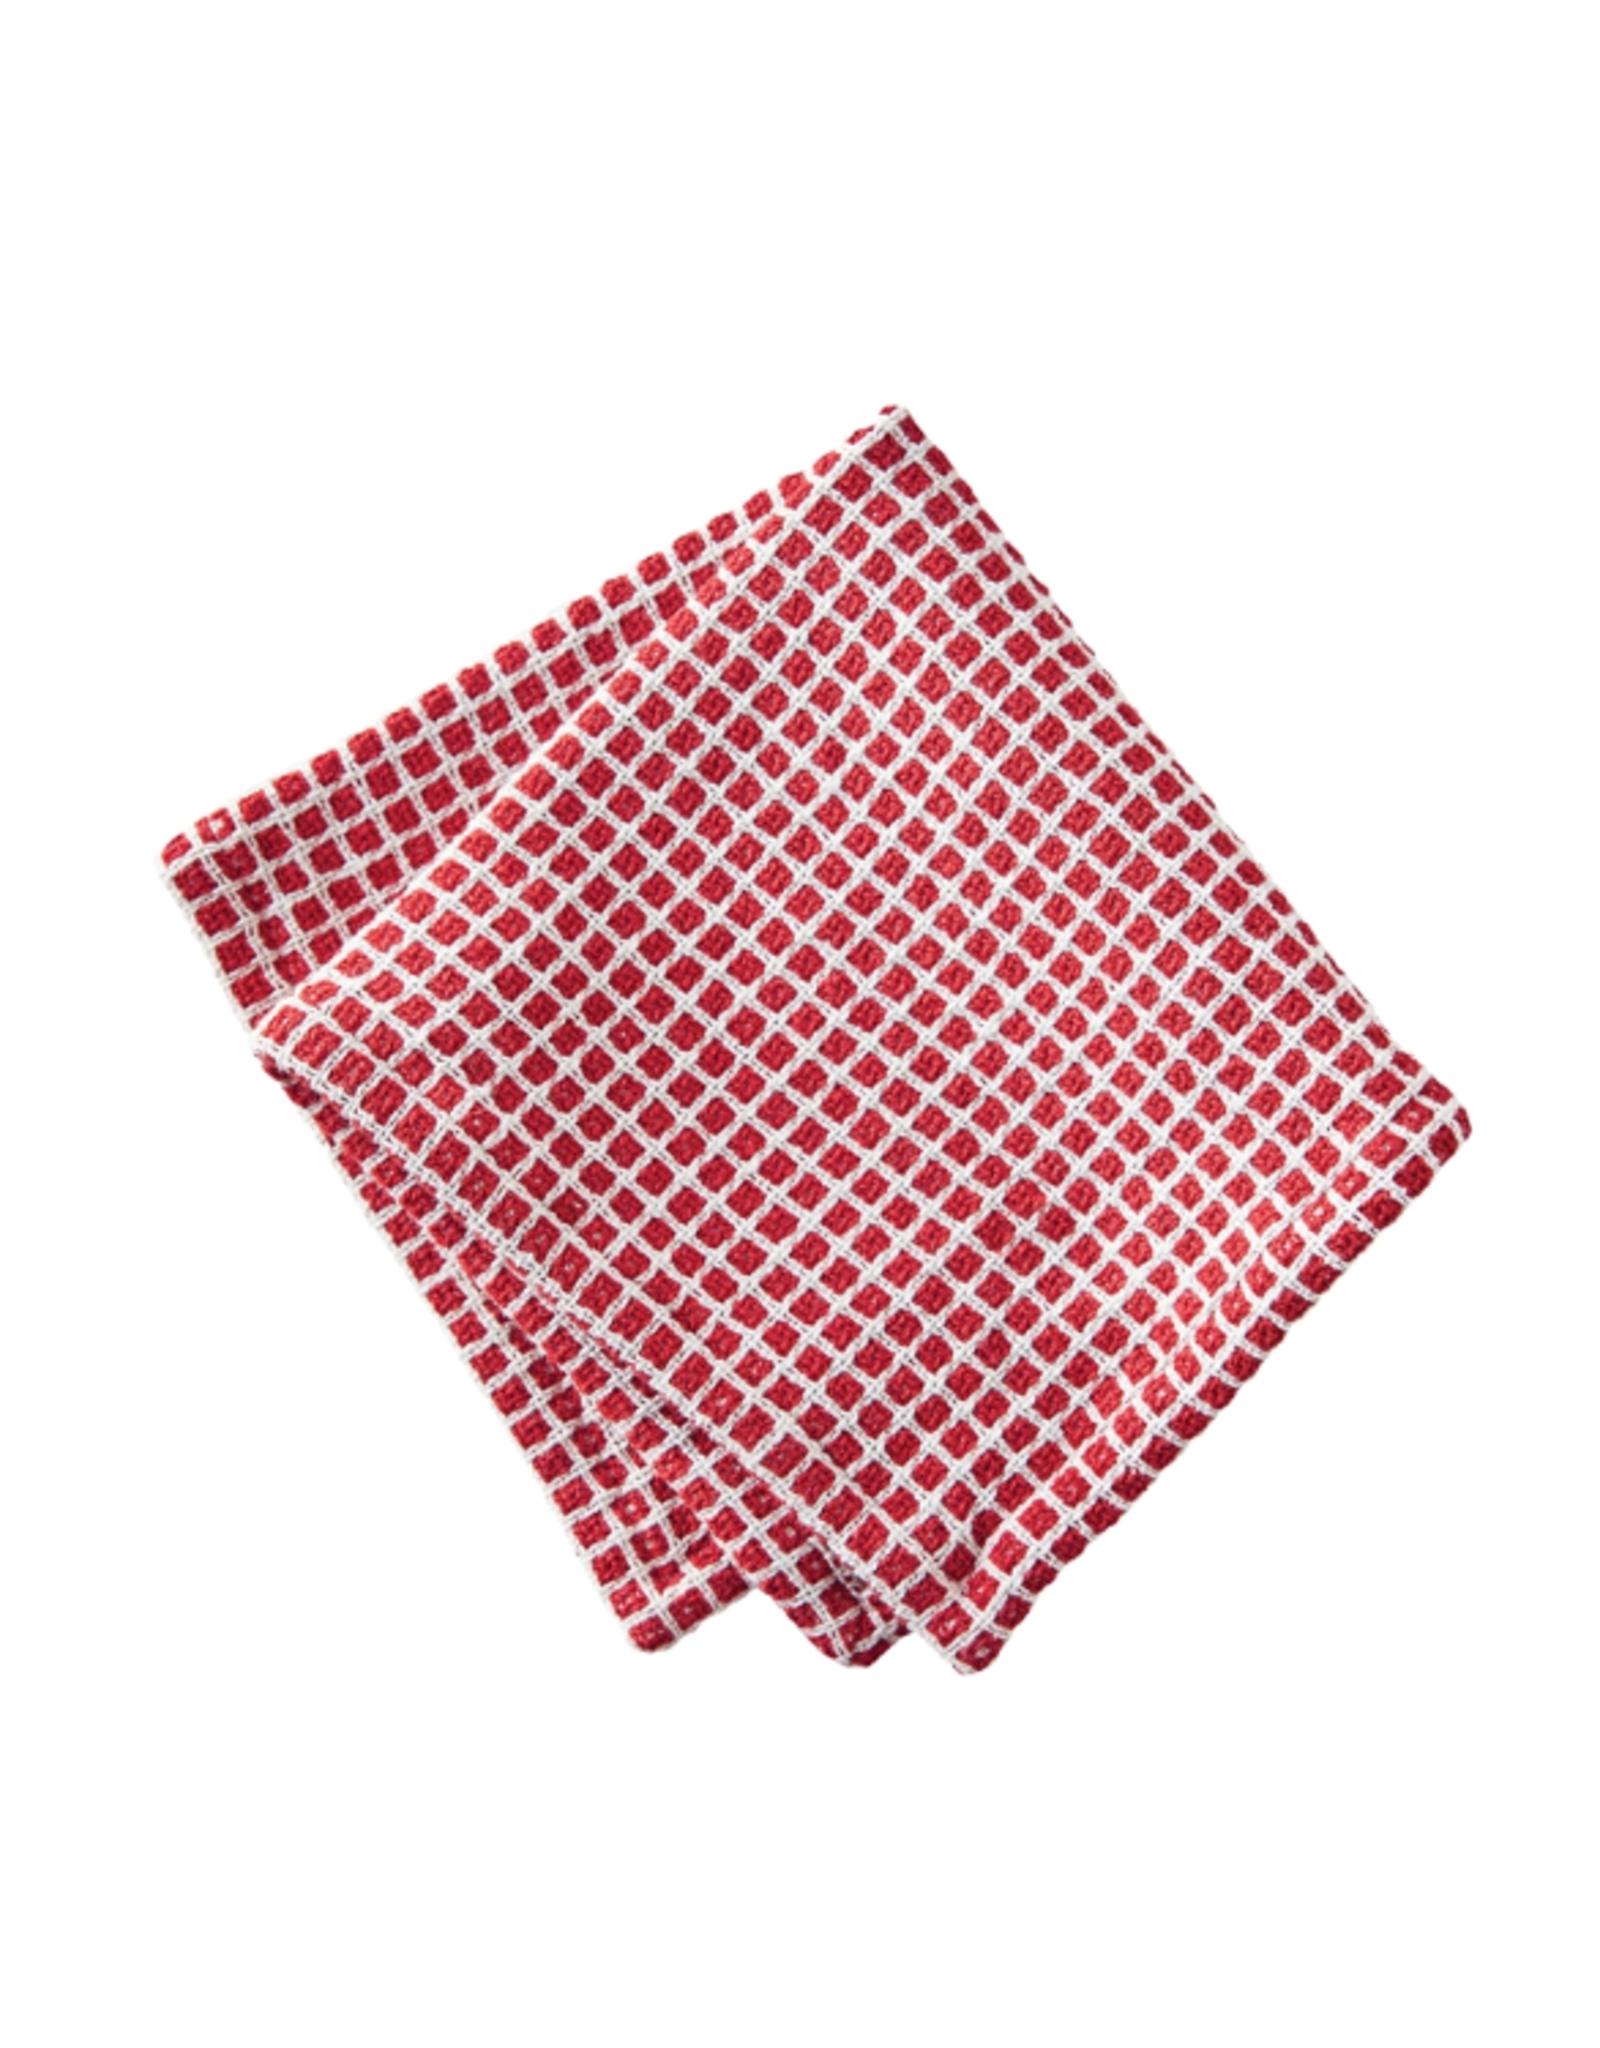 Tag Dishtowel S/2, Red Check